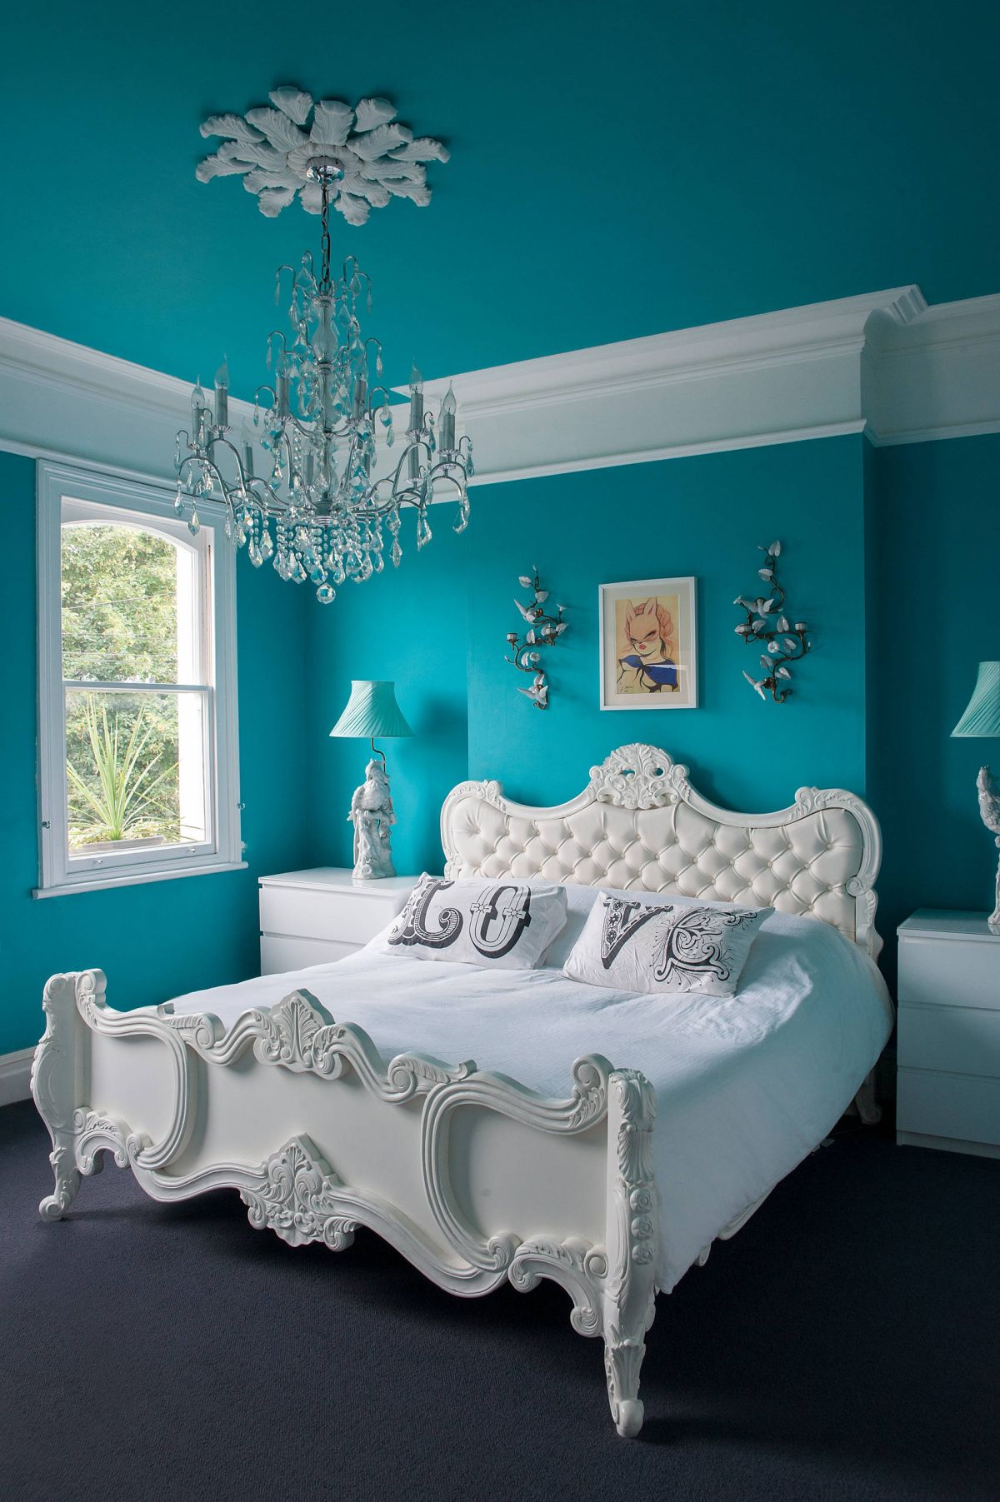 Blue Colors For Bedrooms Bedroom Decor For Women Turquoise Room Elegant Bedroom Design